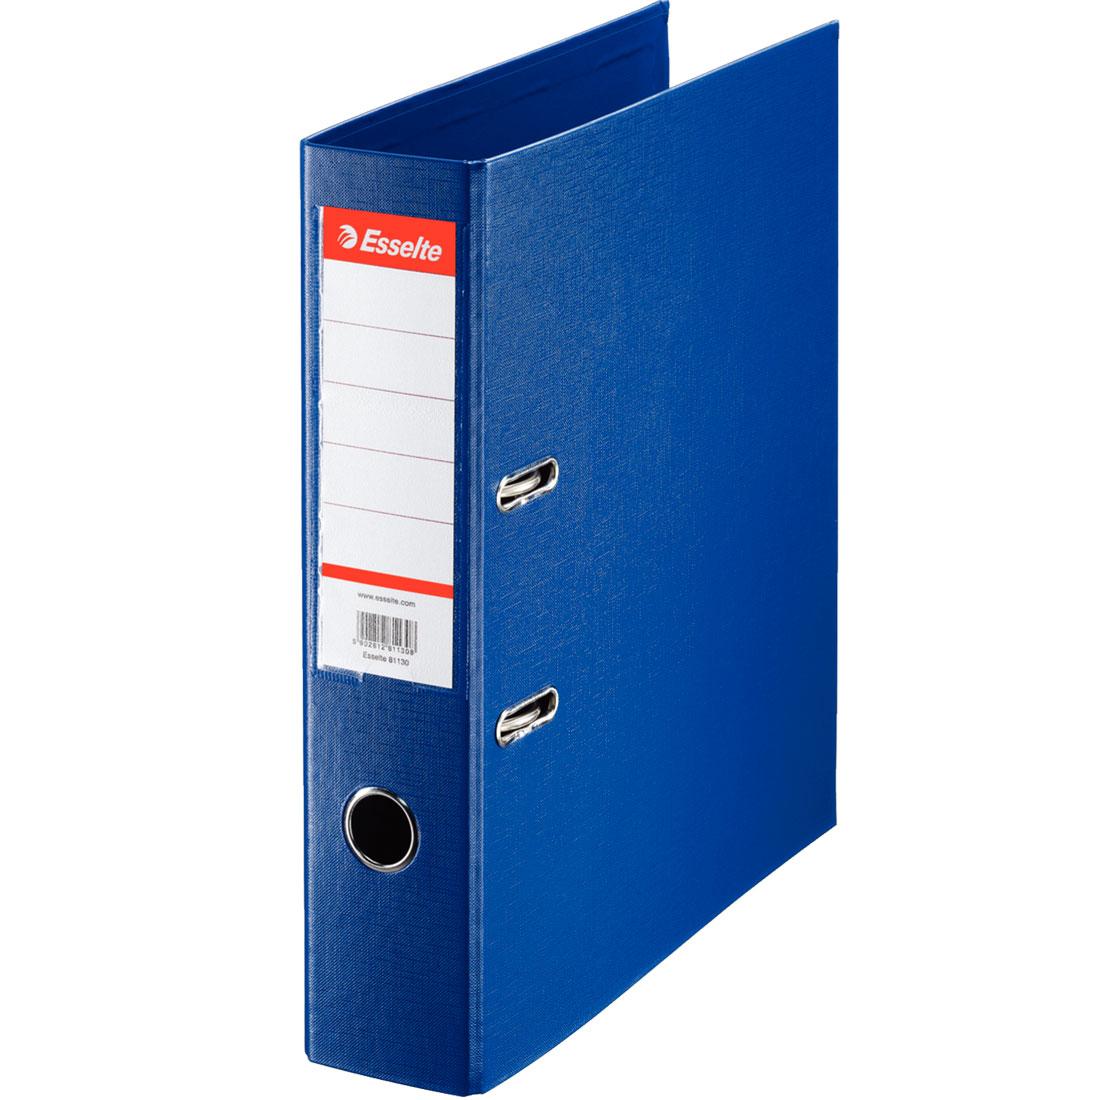 classeur esselte classeur a levier standard 2 anneaux dos 75 mm bleu classeur a levier standard